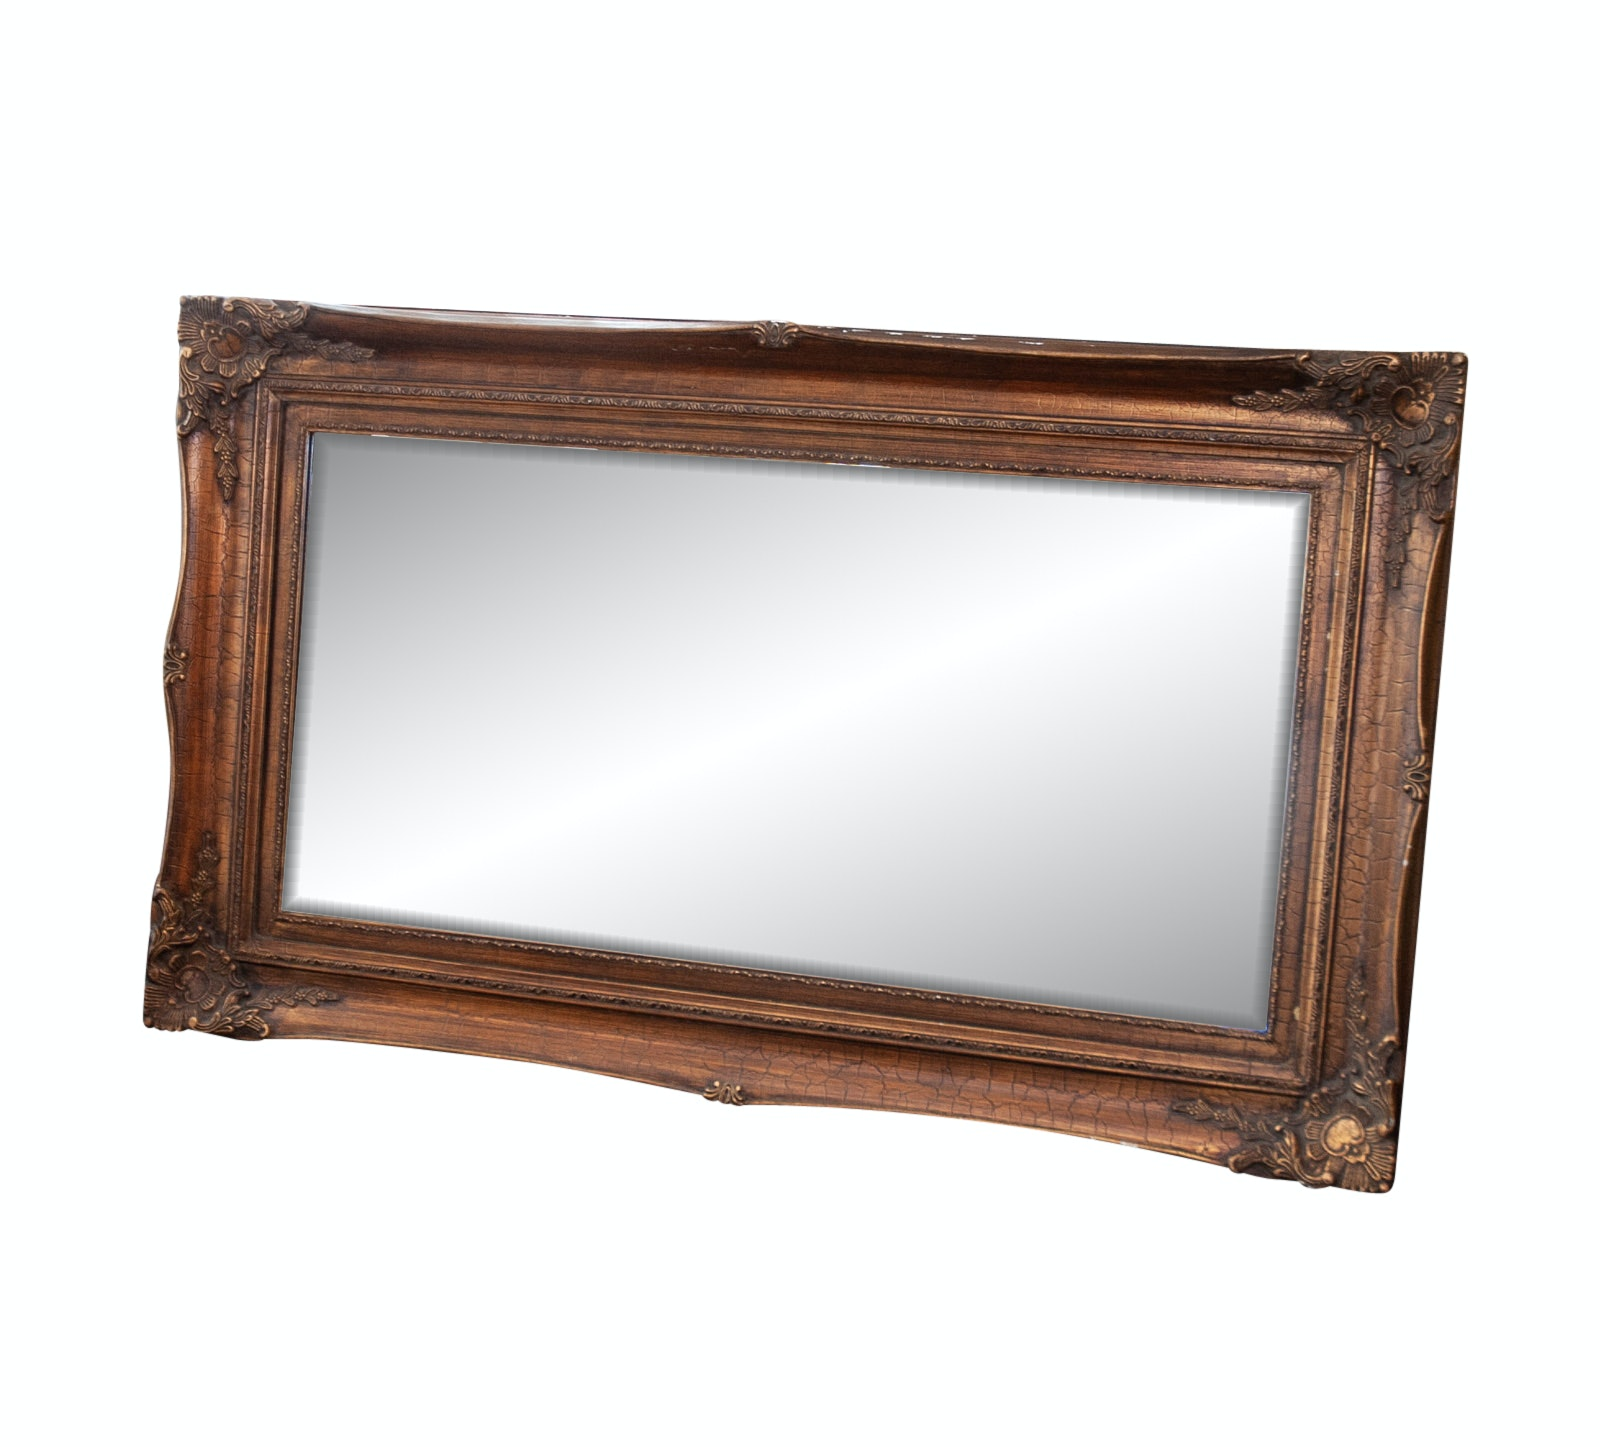 Contemporary Gold Tone Empire Style Wall Mirror